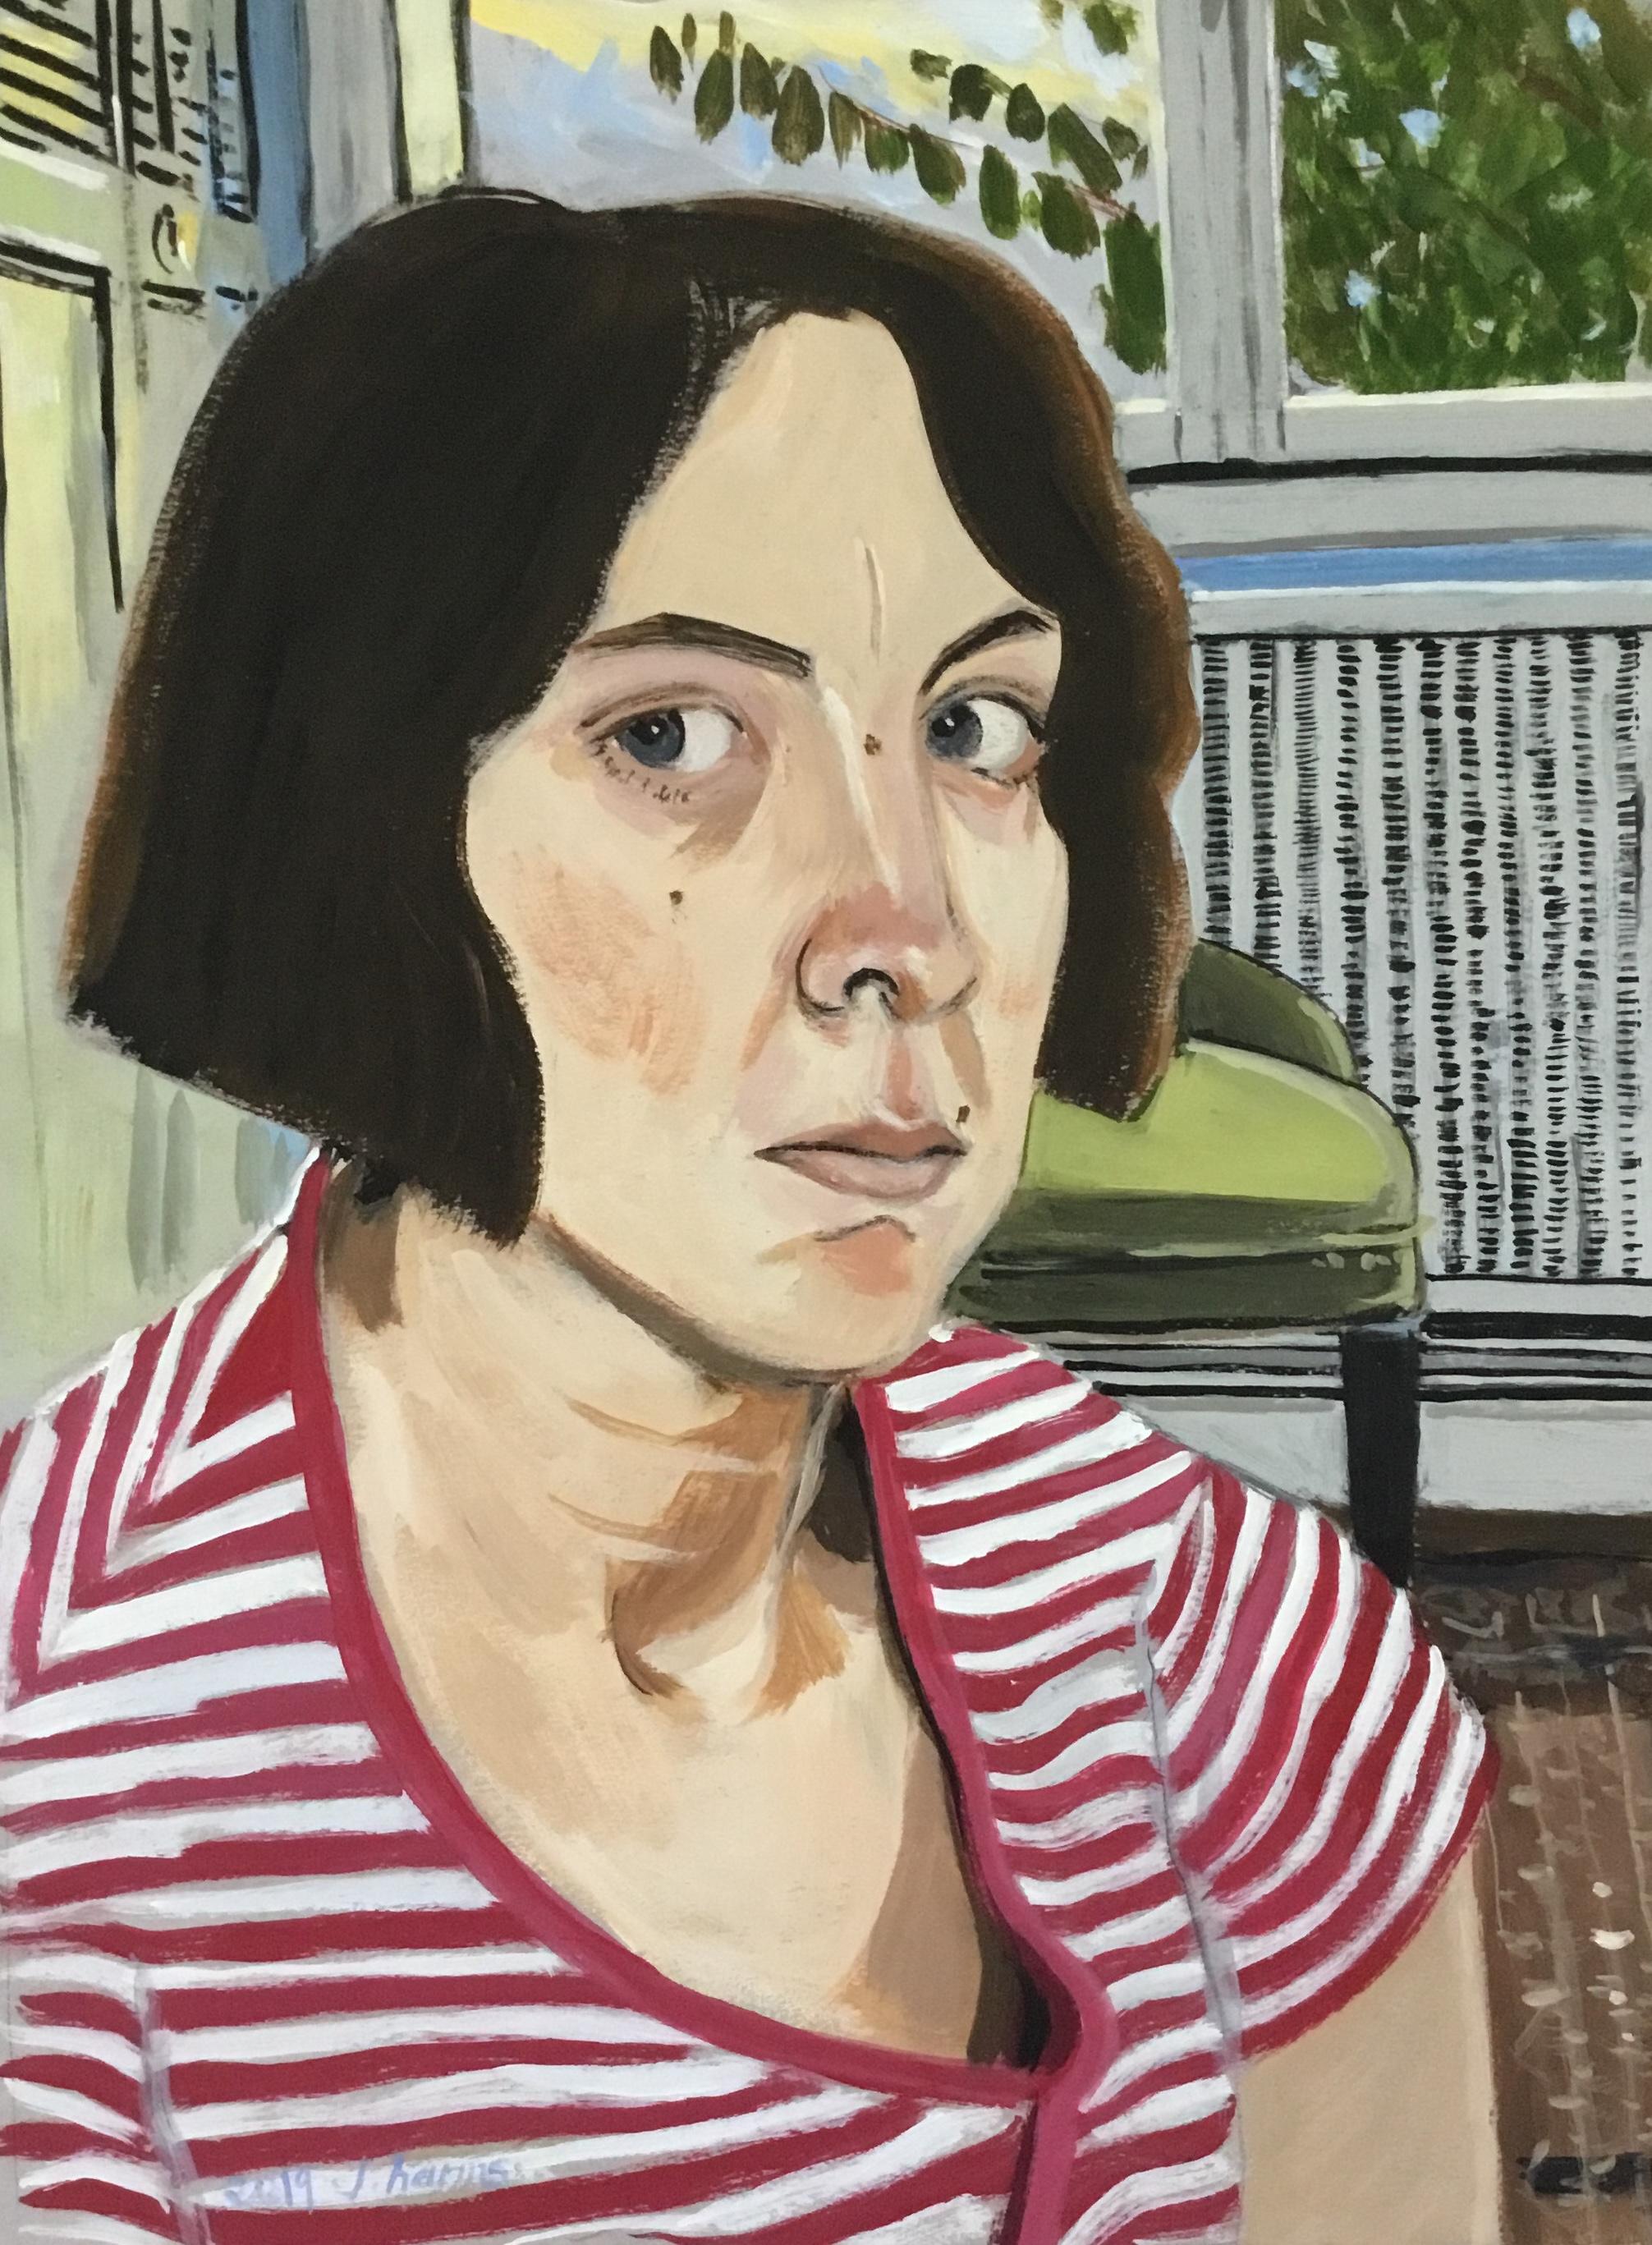 Yearly self-portrait au carré. 2019. J.Harms.